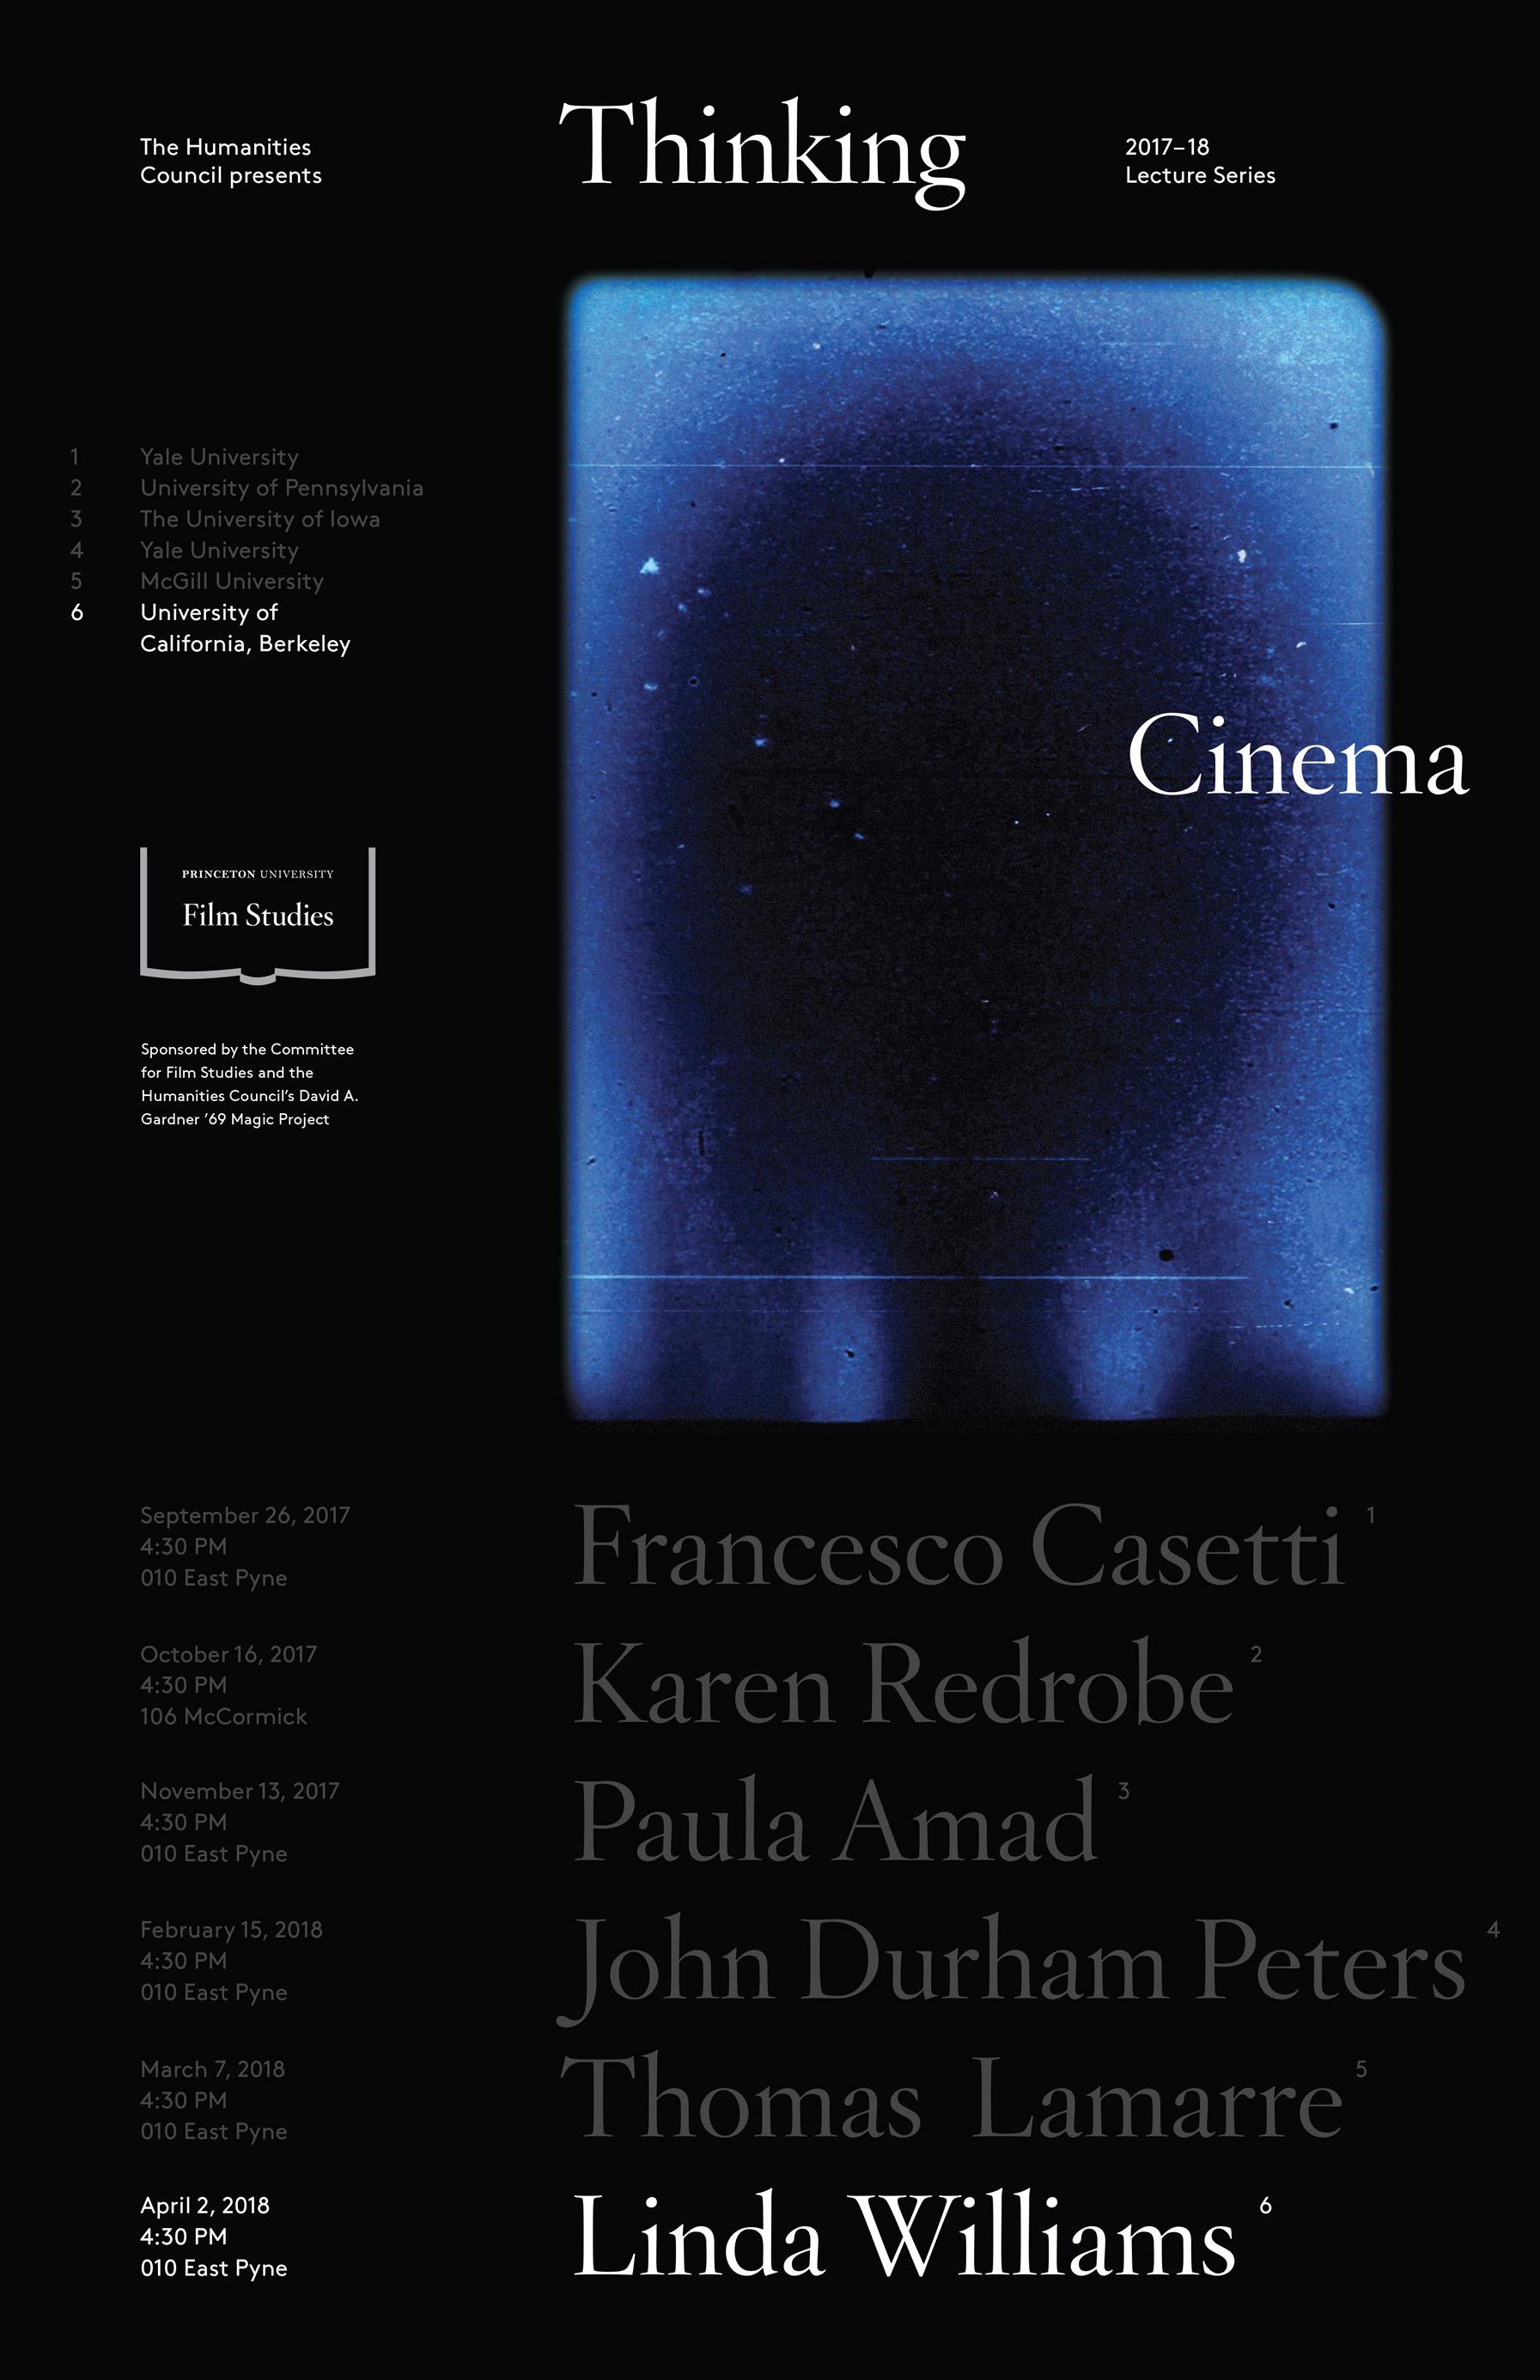 Thinking-Cinema_ac-6.jpg